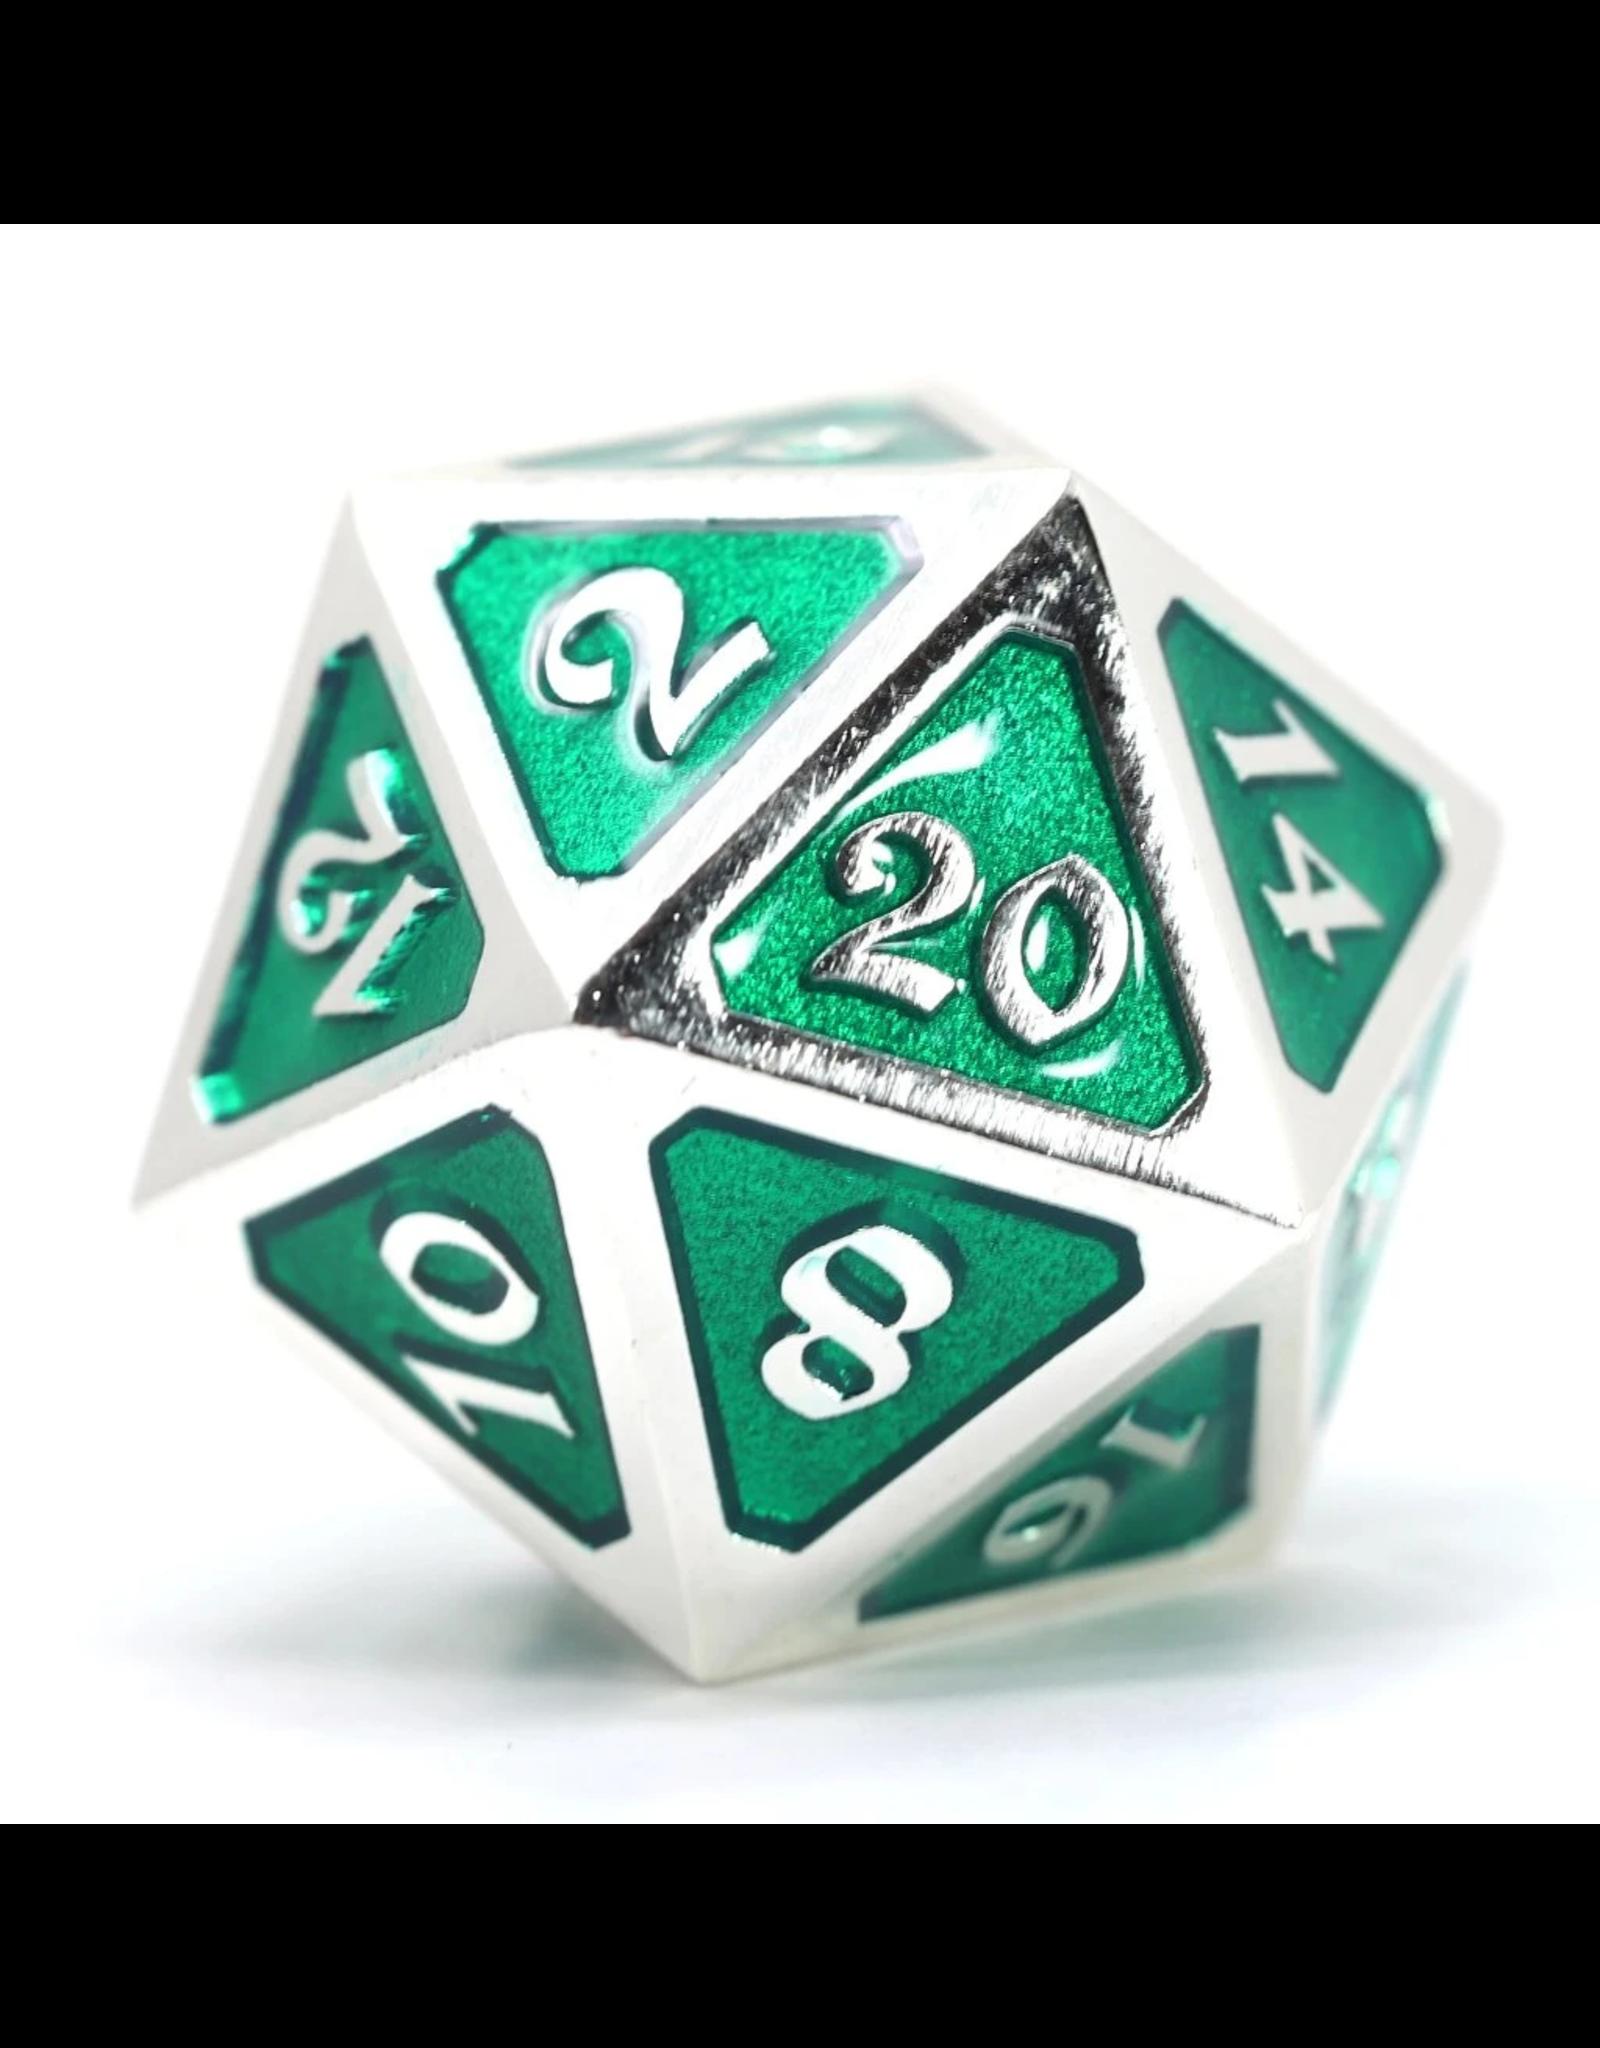 Die Hard Dice Die Hard Dice: Dire d20 Mythica Platinum Emerald